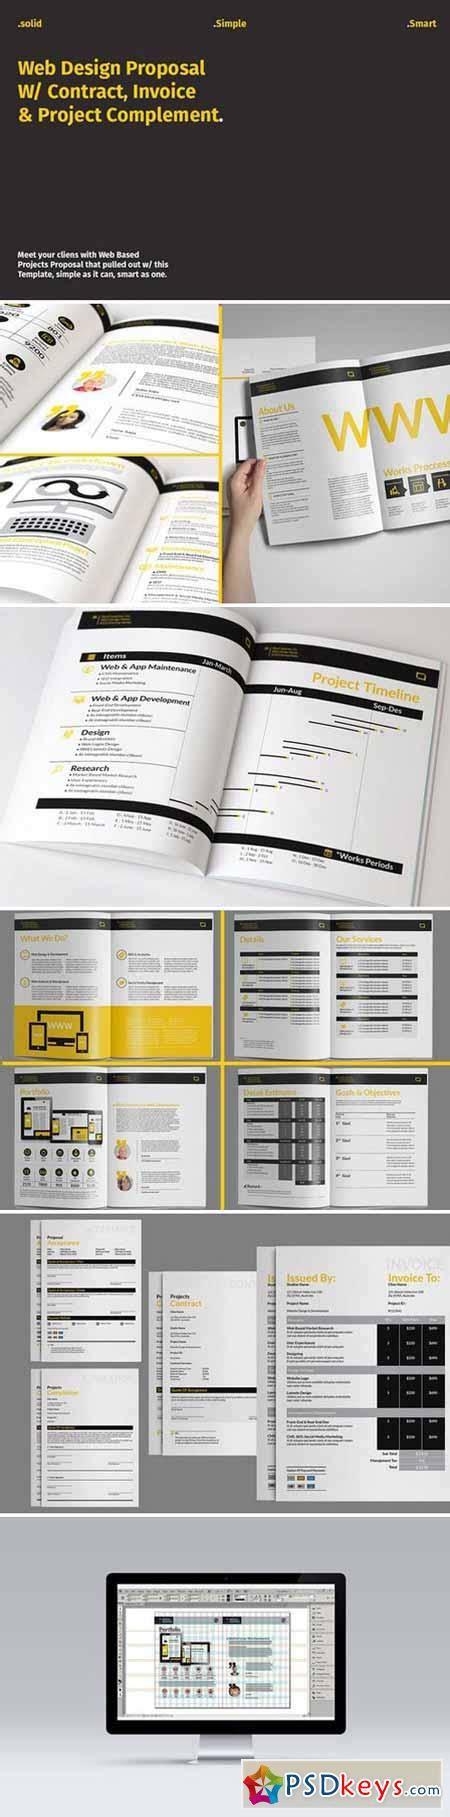 design proposal font web design proposal w complement 339030 187 free download